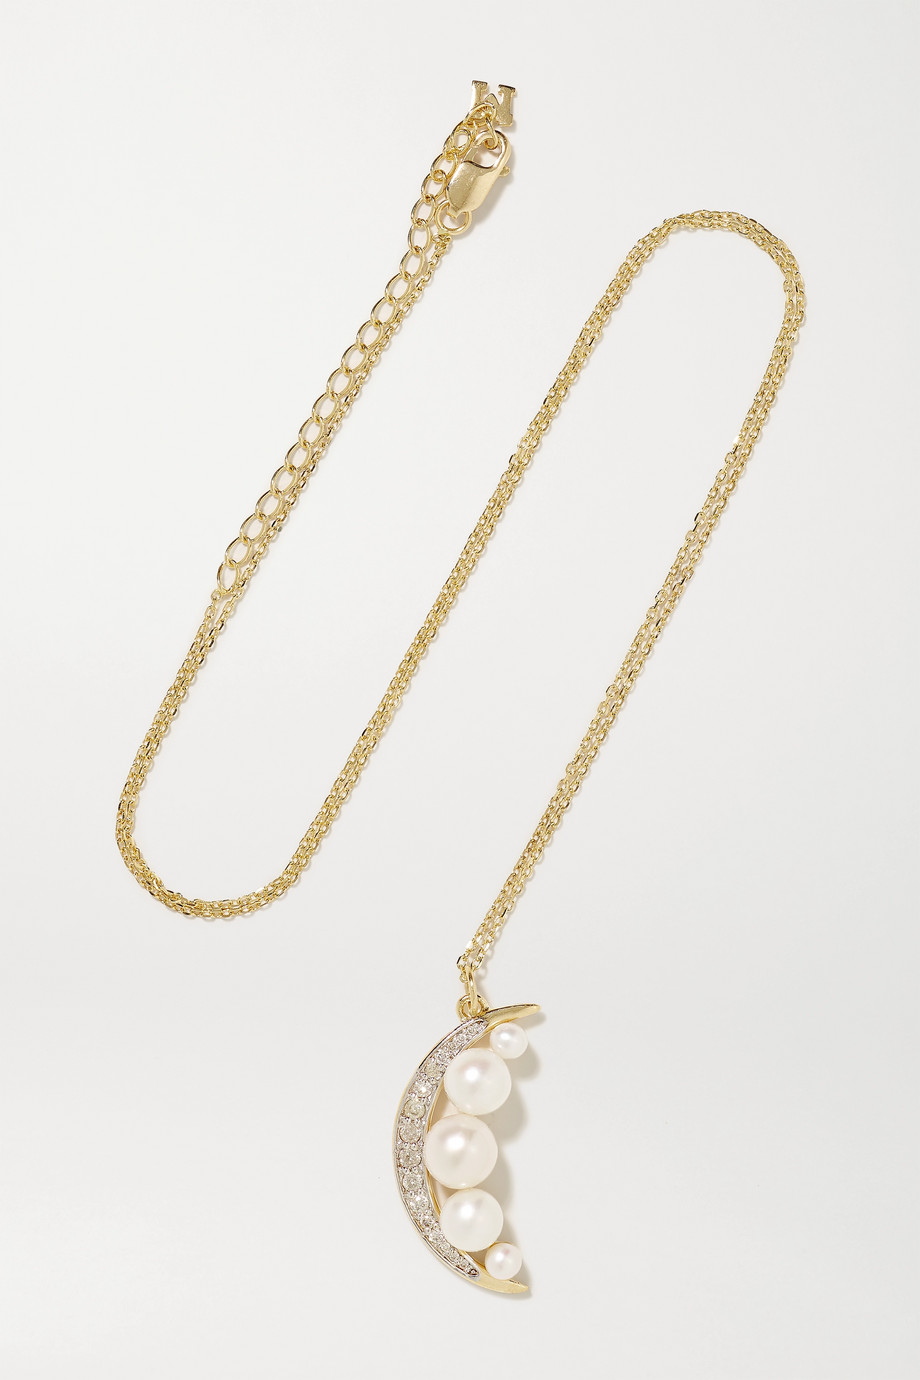 Mateo 14K 黄金、珍珠、钻石项链